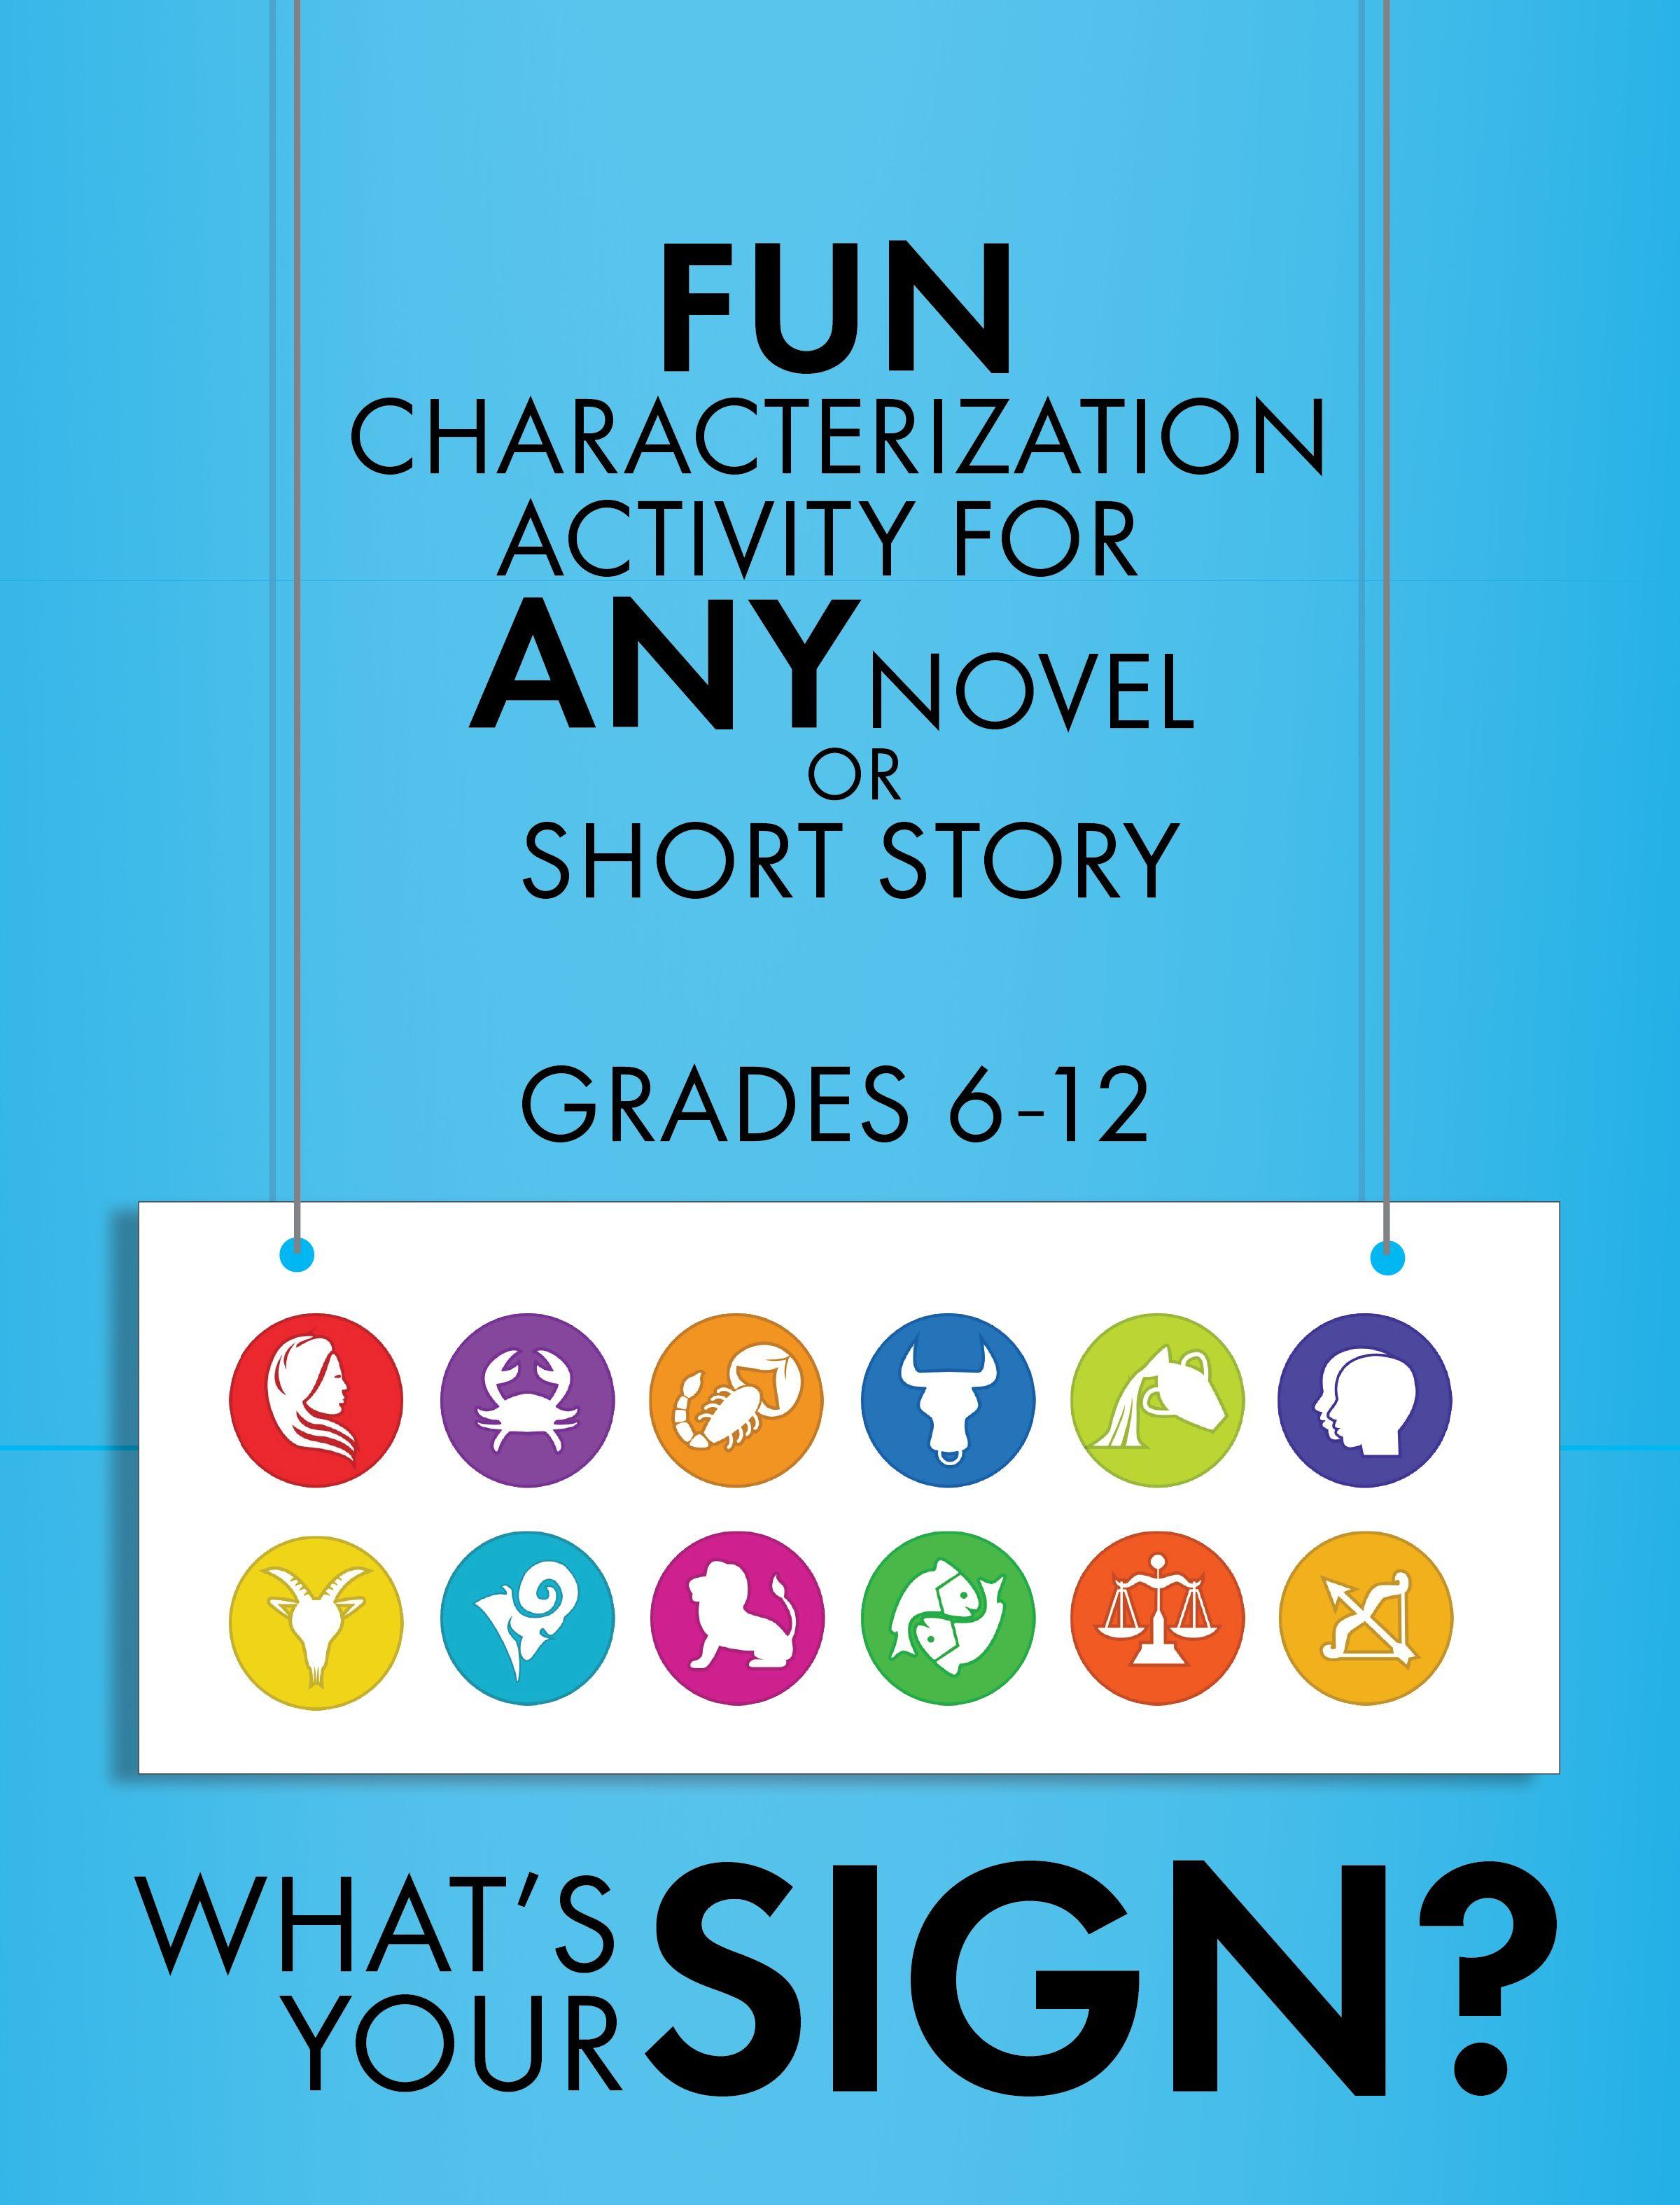 Horoscope Characterization Worksheet To Use With Any